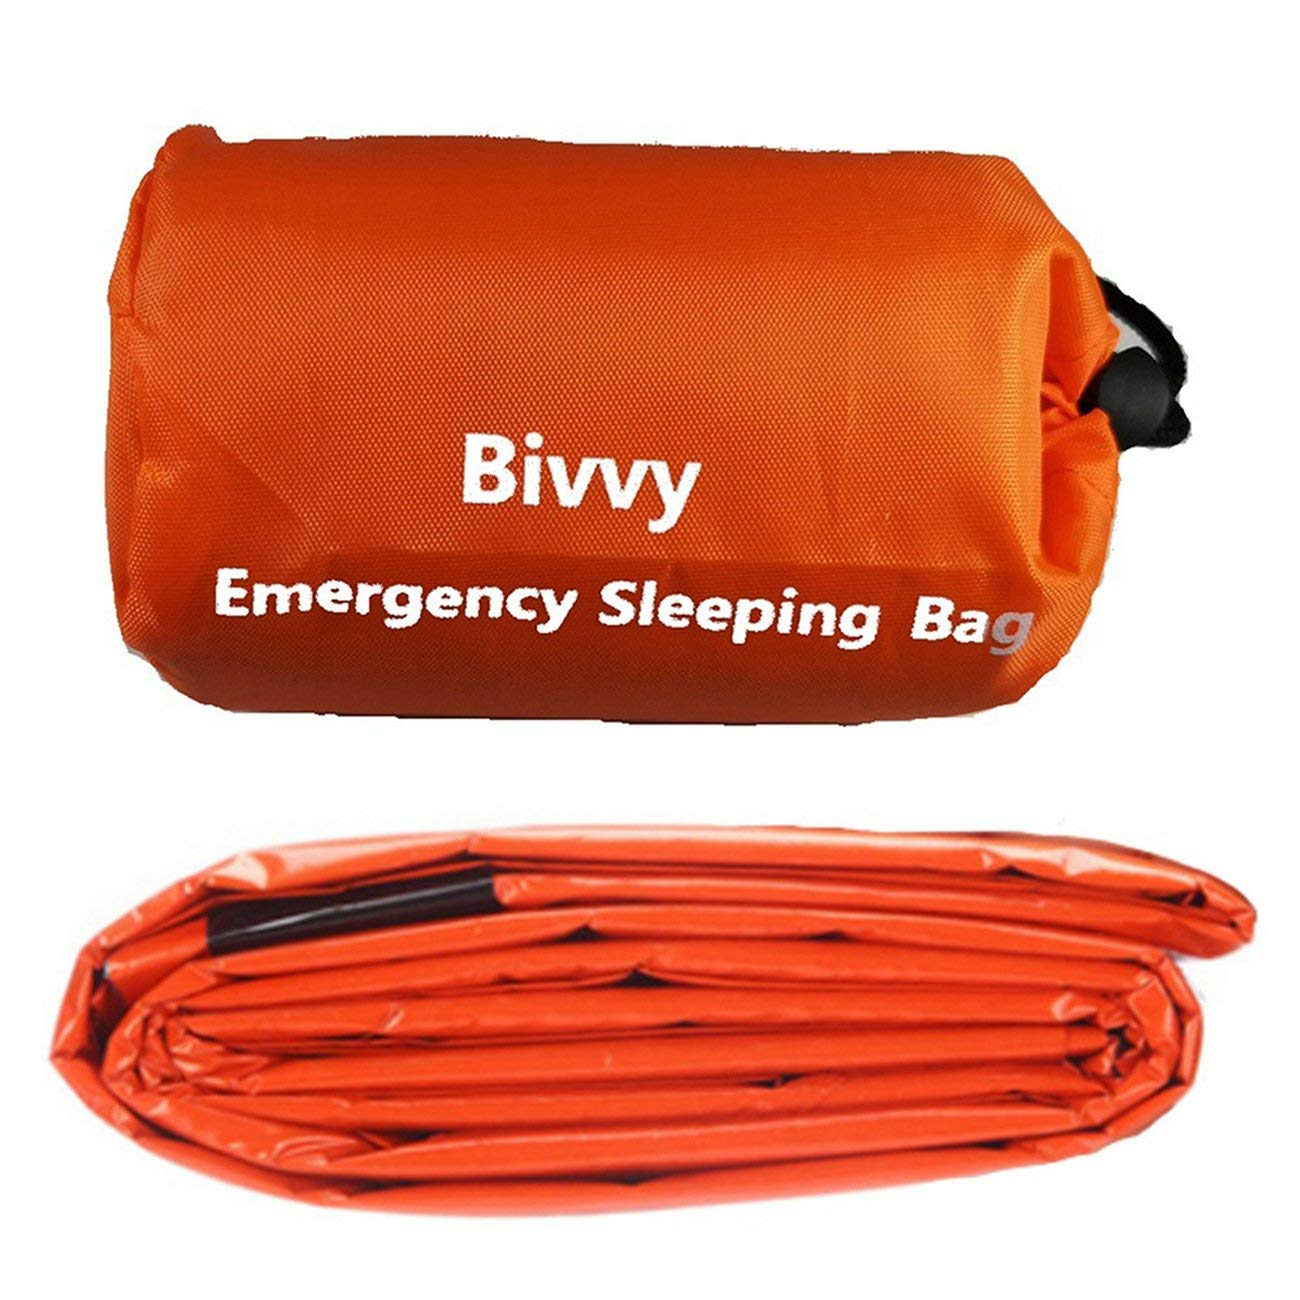 Orange JIUY Reusable Emergency Sleeping Bag Thermal Waterproof Survival Camping Travel Bag Safety Durable Portable